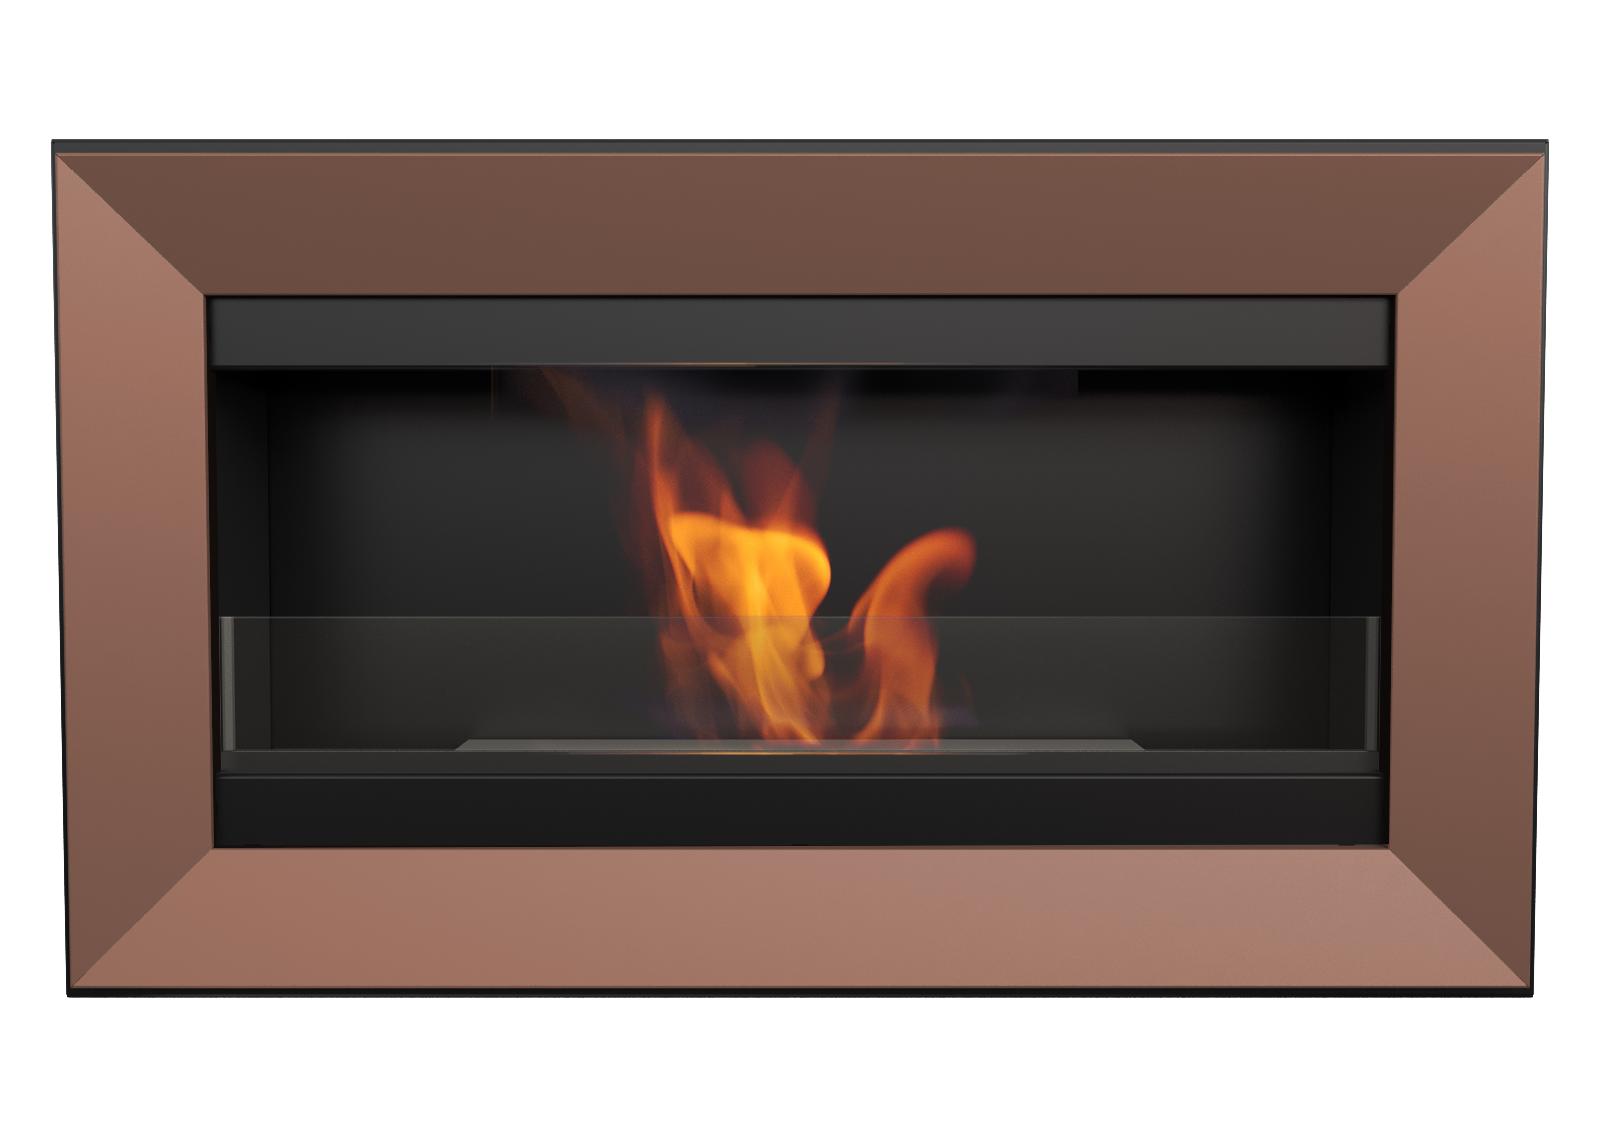 biokamin wandkamin ethanol kamin kupfer dekorativkamin gelkamin mit glassscheibe ebay. Black Bedroom Furniture Sets. Home Design Ideas